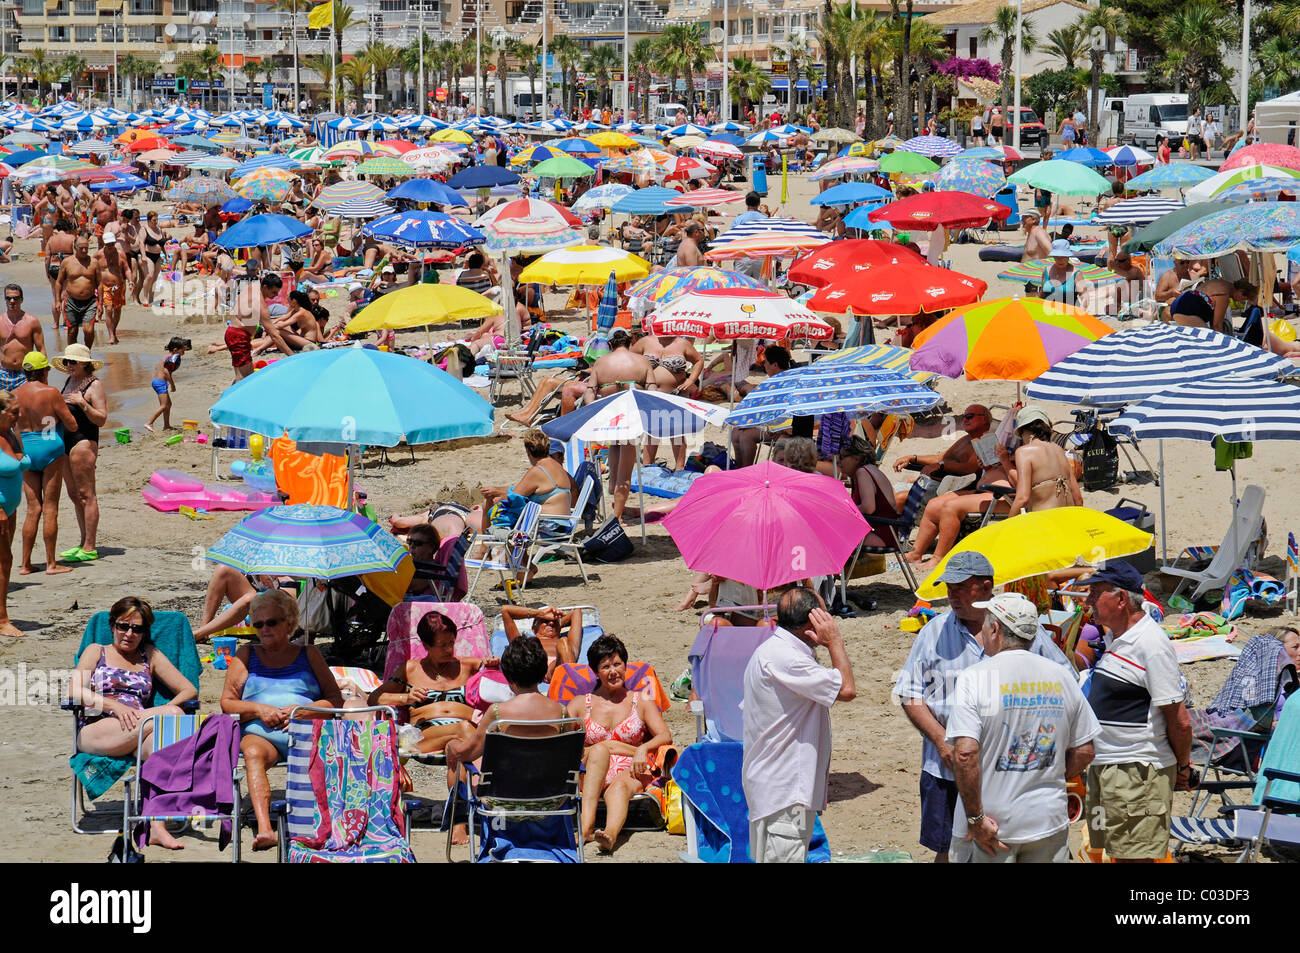 Urlauber, bunte Sonnenschirme, Playa de Levante Strand, Benidorm, Costa Blanca, Alicante, Spanien, Europa Stockbild